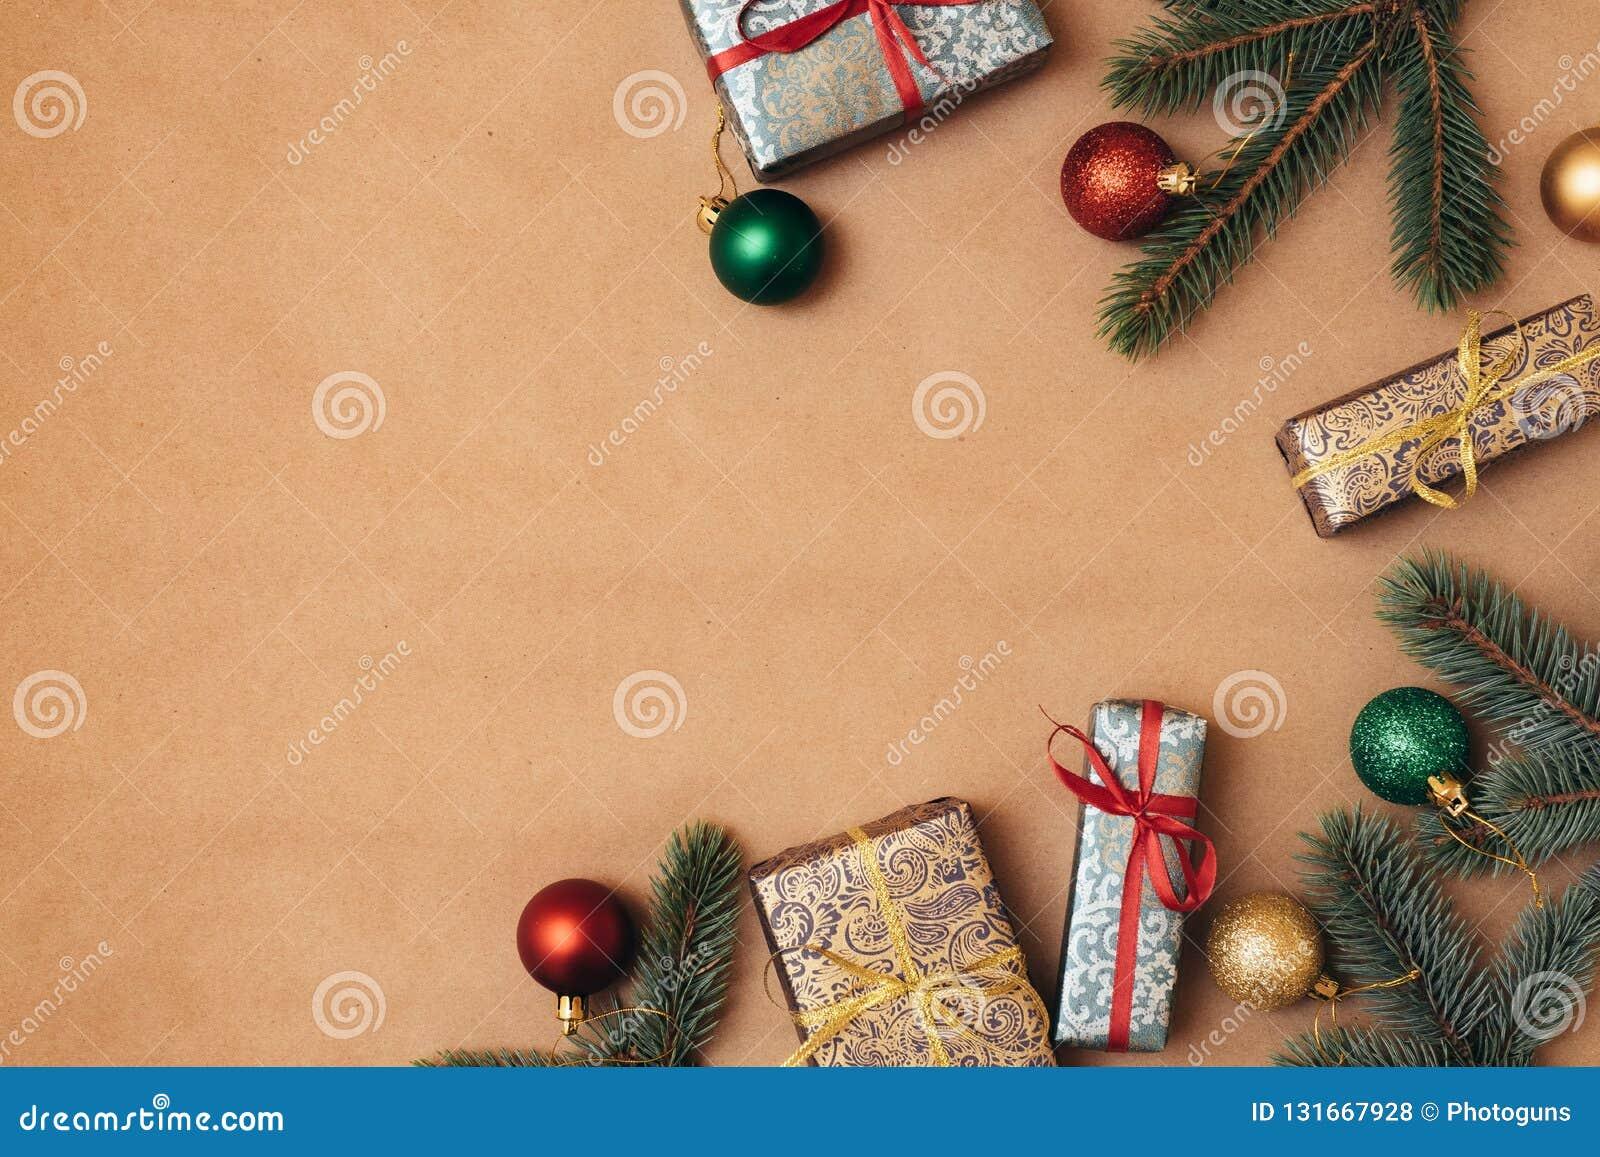 Vintage Christmas Card Xmas Decorations On Kraft Paper Background